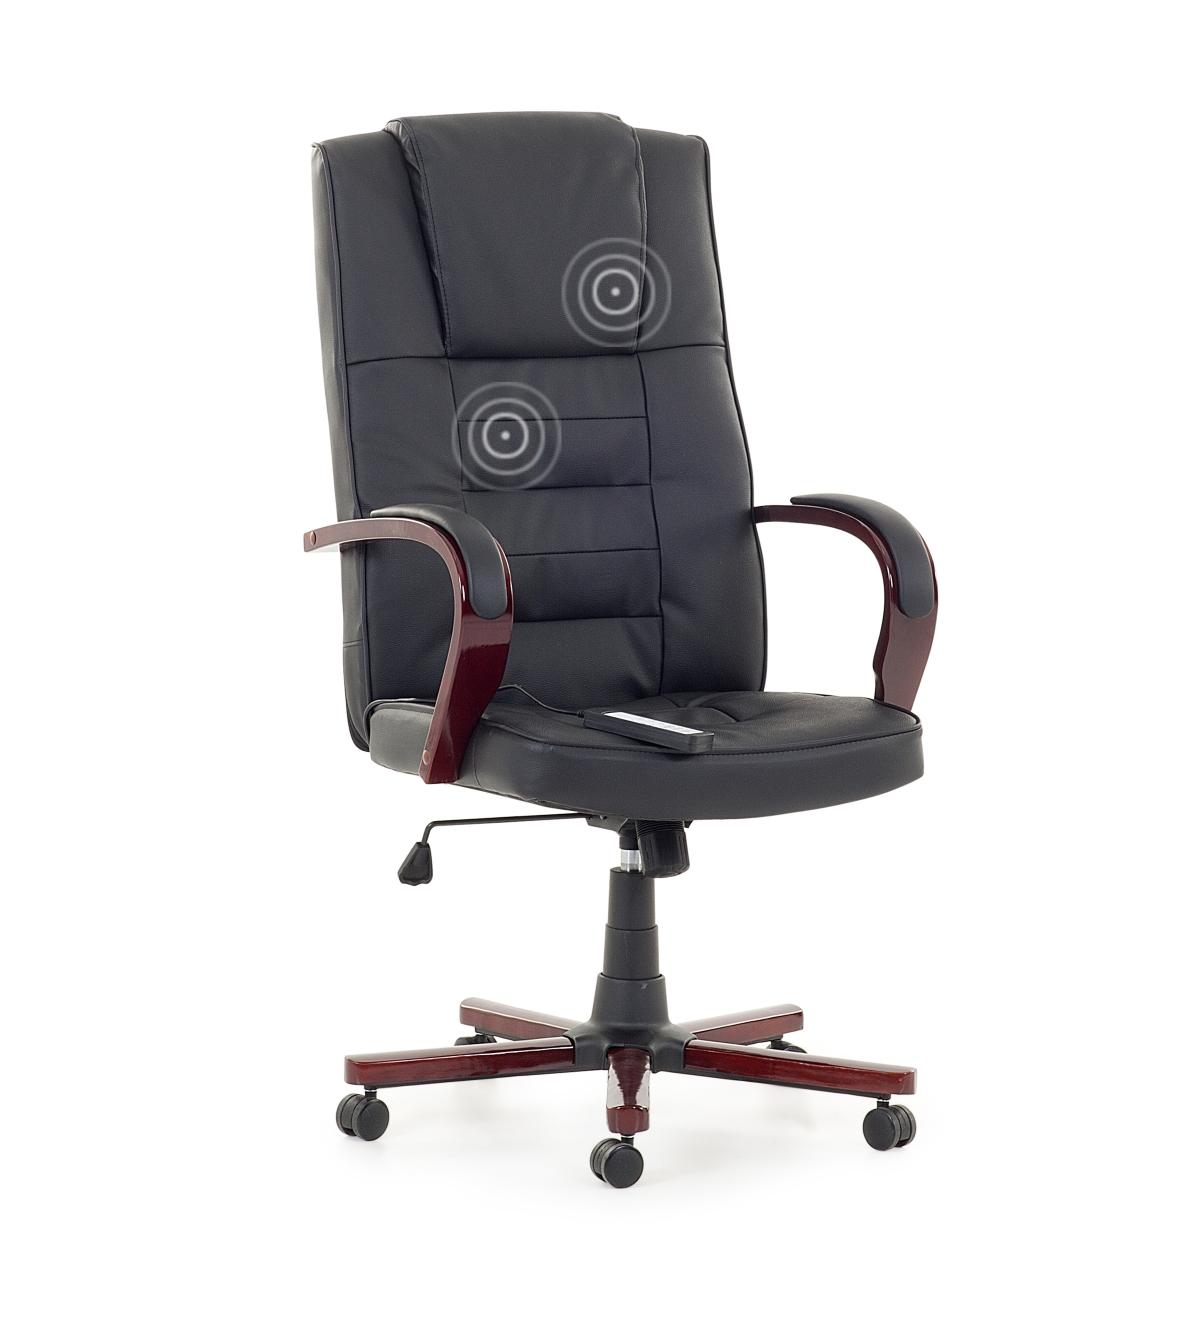 massagesessel g nstig kaufen m nz intelly 3d massagesessel massagesessel f r gewerbliche oder. Black Bedroom Furniture Sets. Home Design Ideas